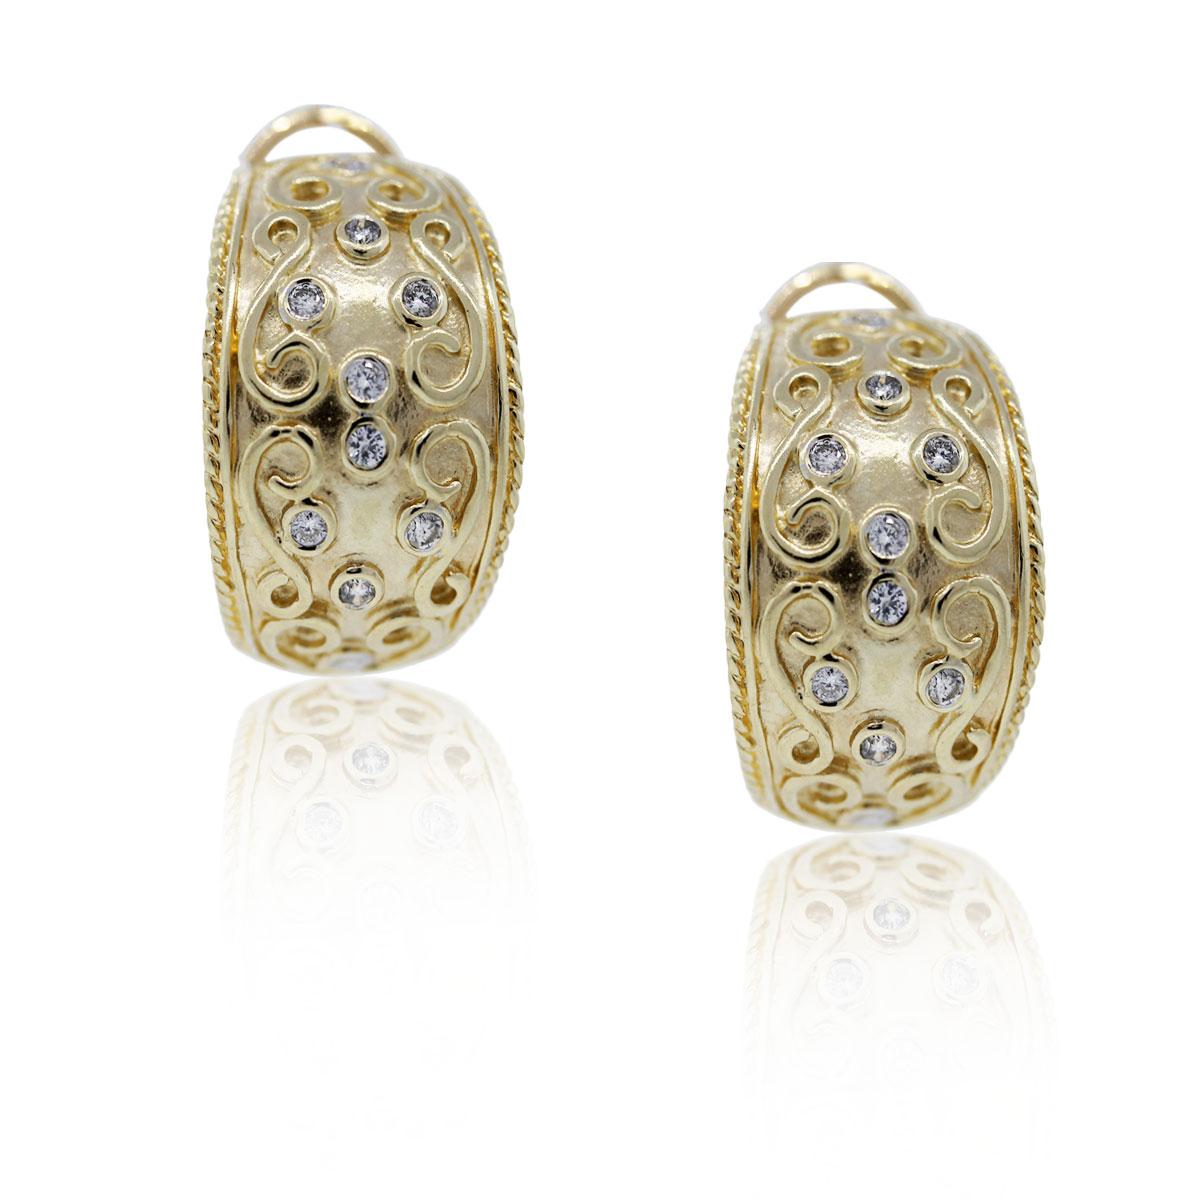 14K Yellow Gold and Diamond Huggie Earrings